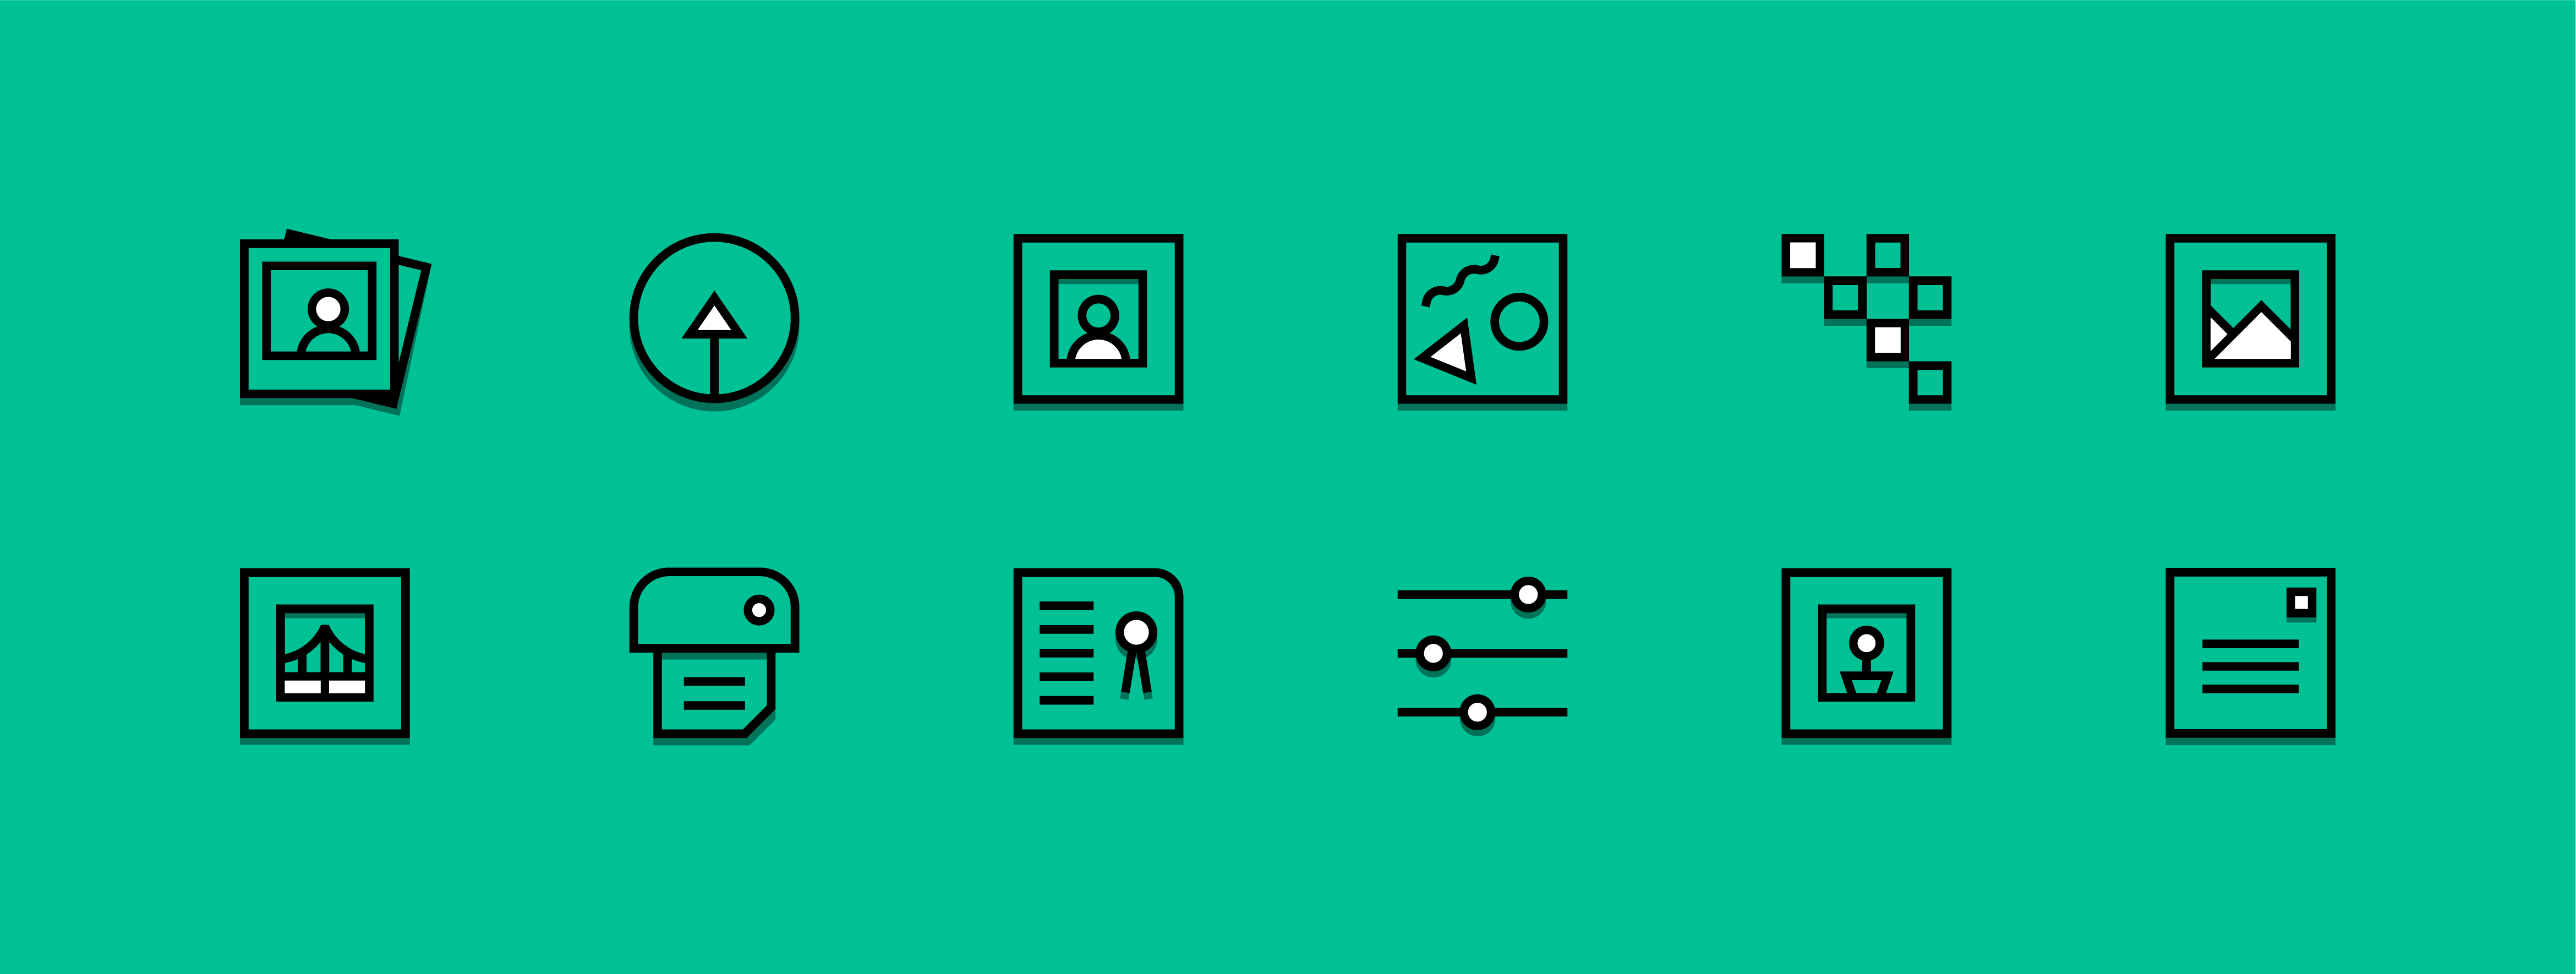 Web Design DevBootcamp homepage